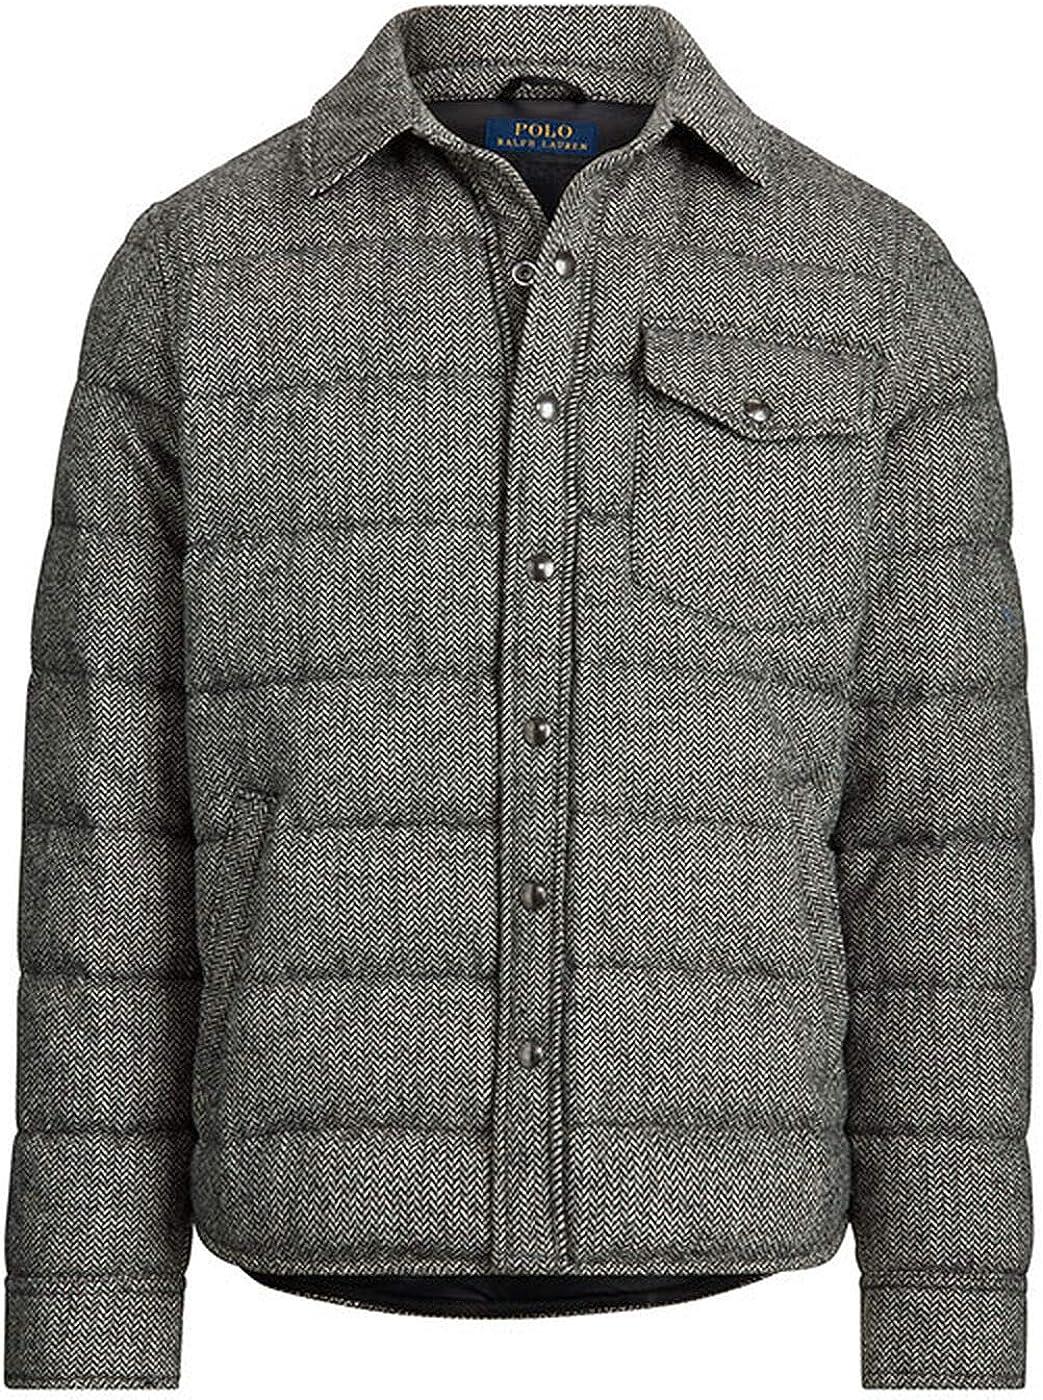 Polo Ralph Lauren Men's Herringbone Quilted Down Shirt Jacket, Charcoal Grey, XL